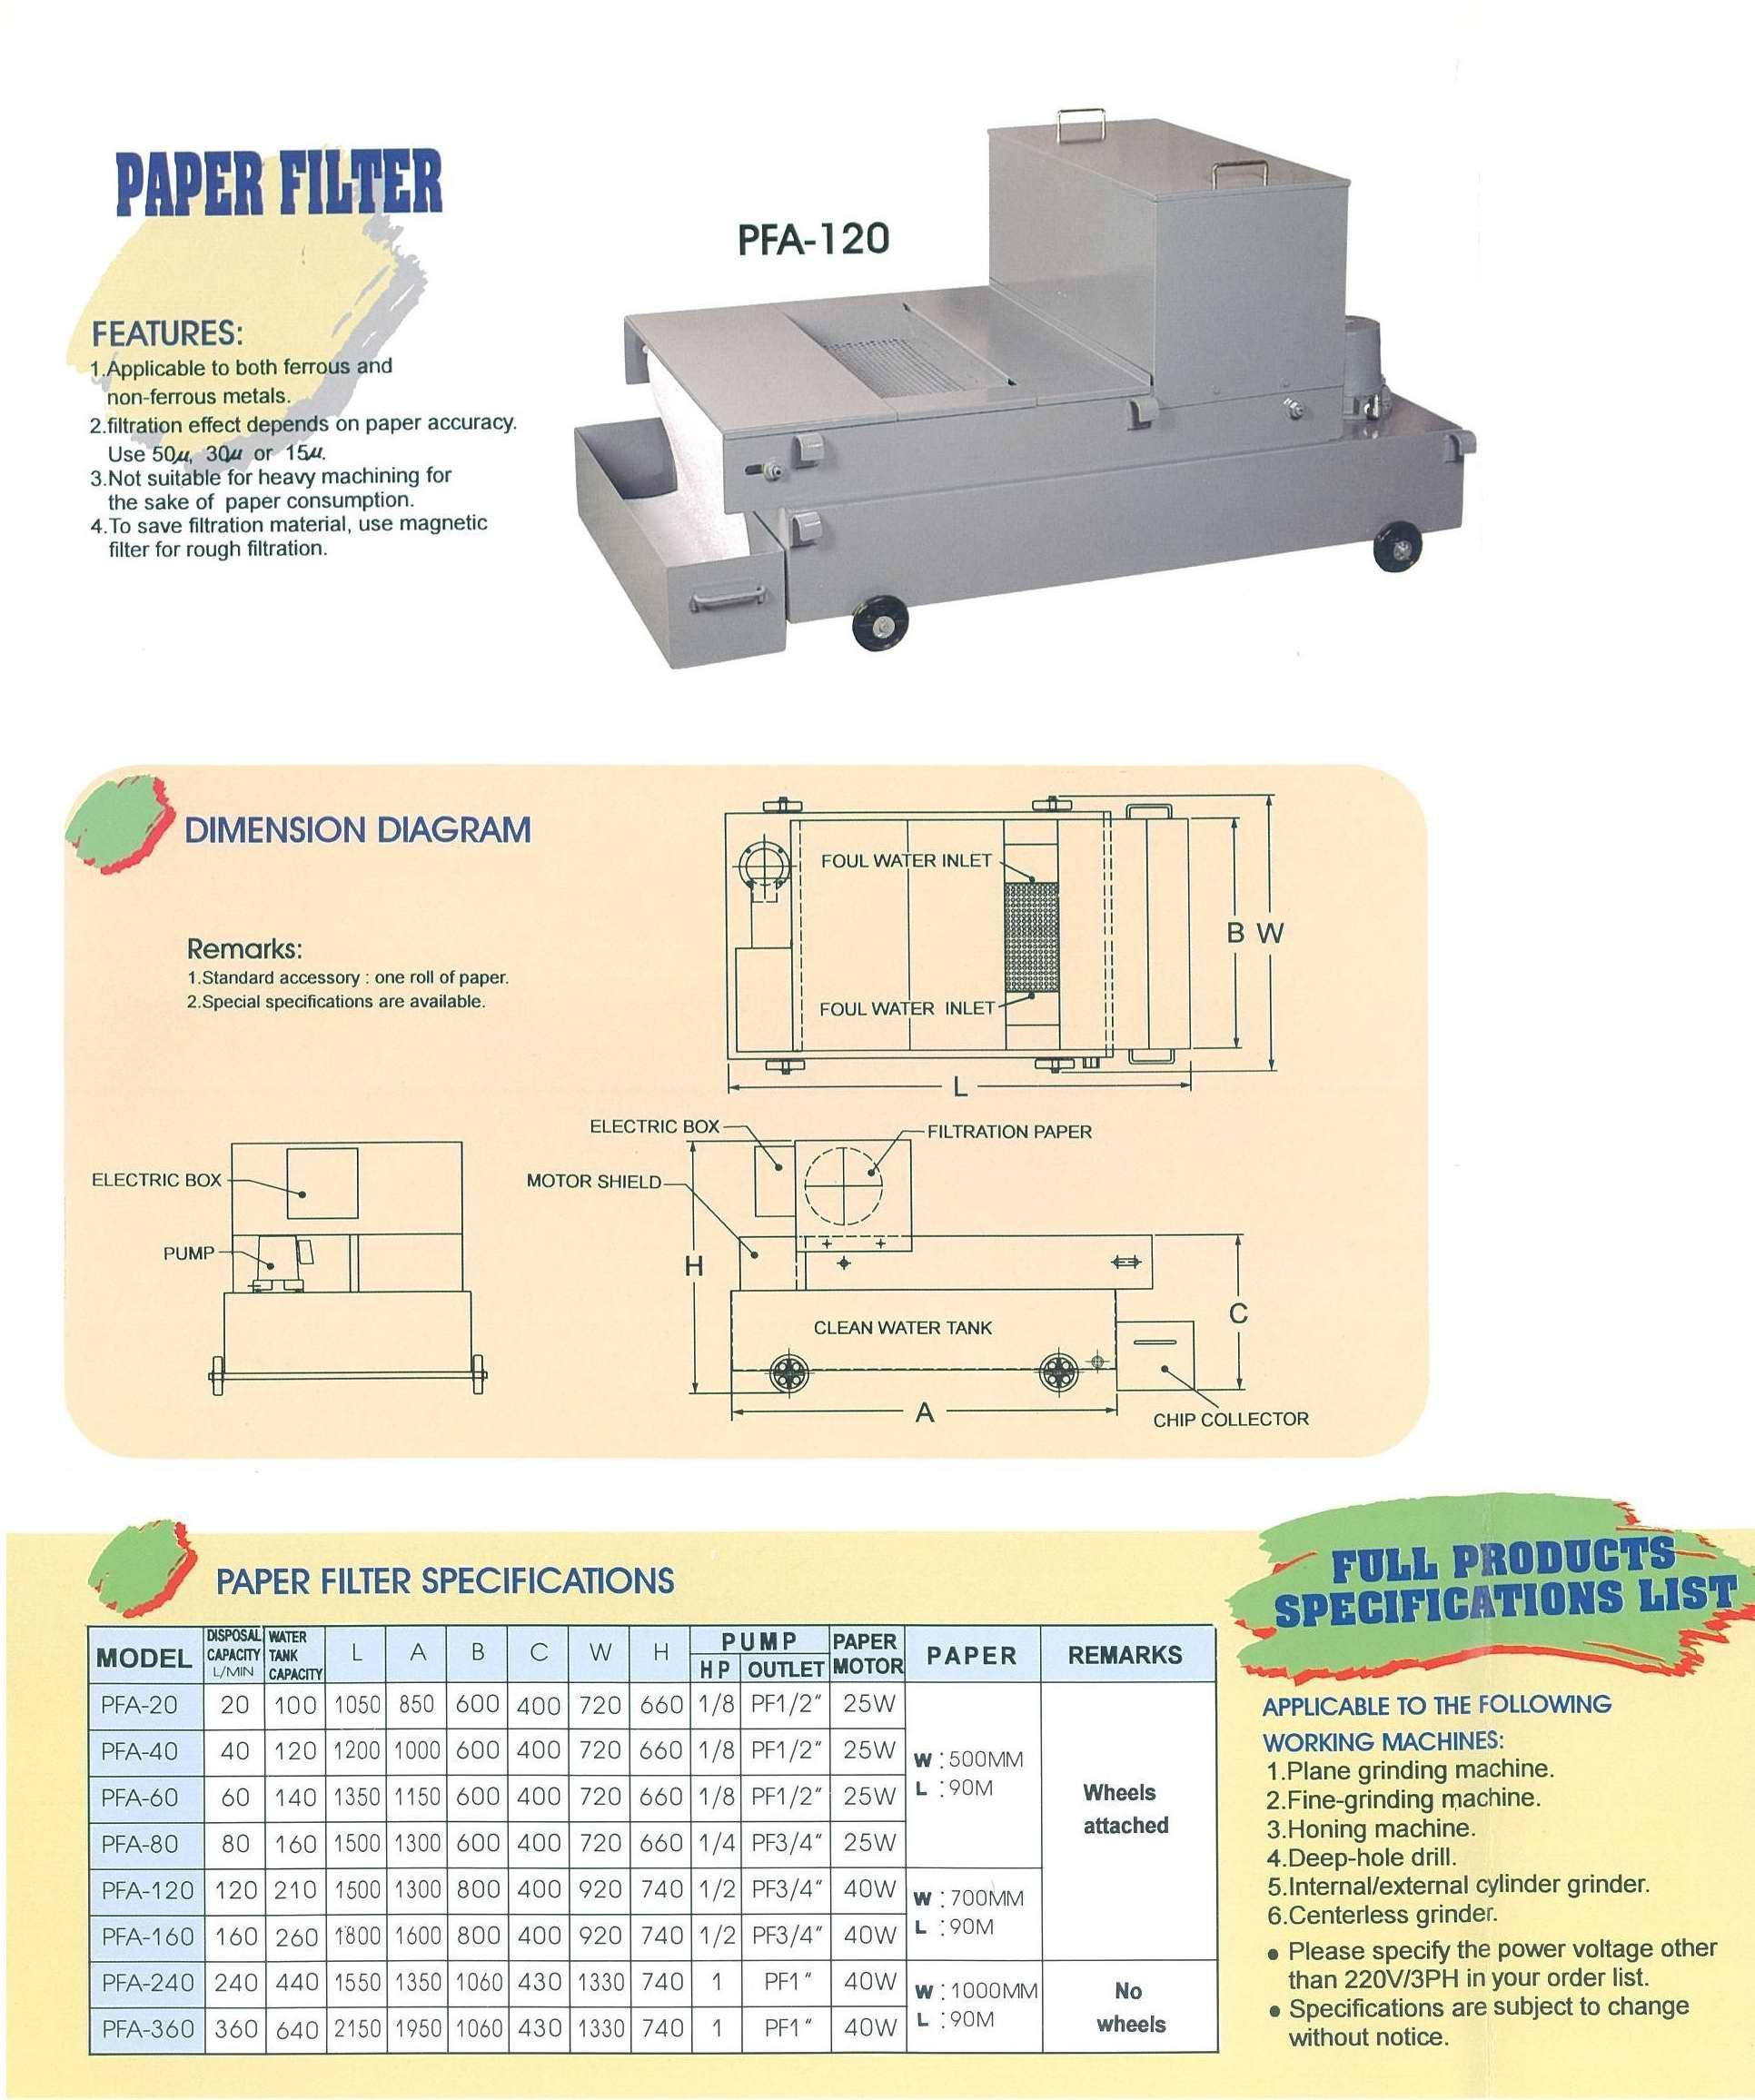 Taiwan Pepar Bed Filter, Paper Filter, Grinding Machine